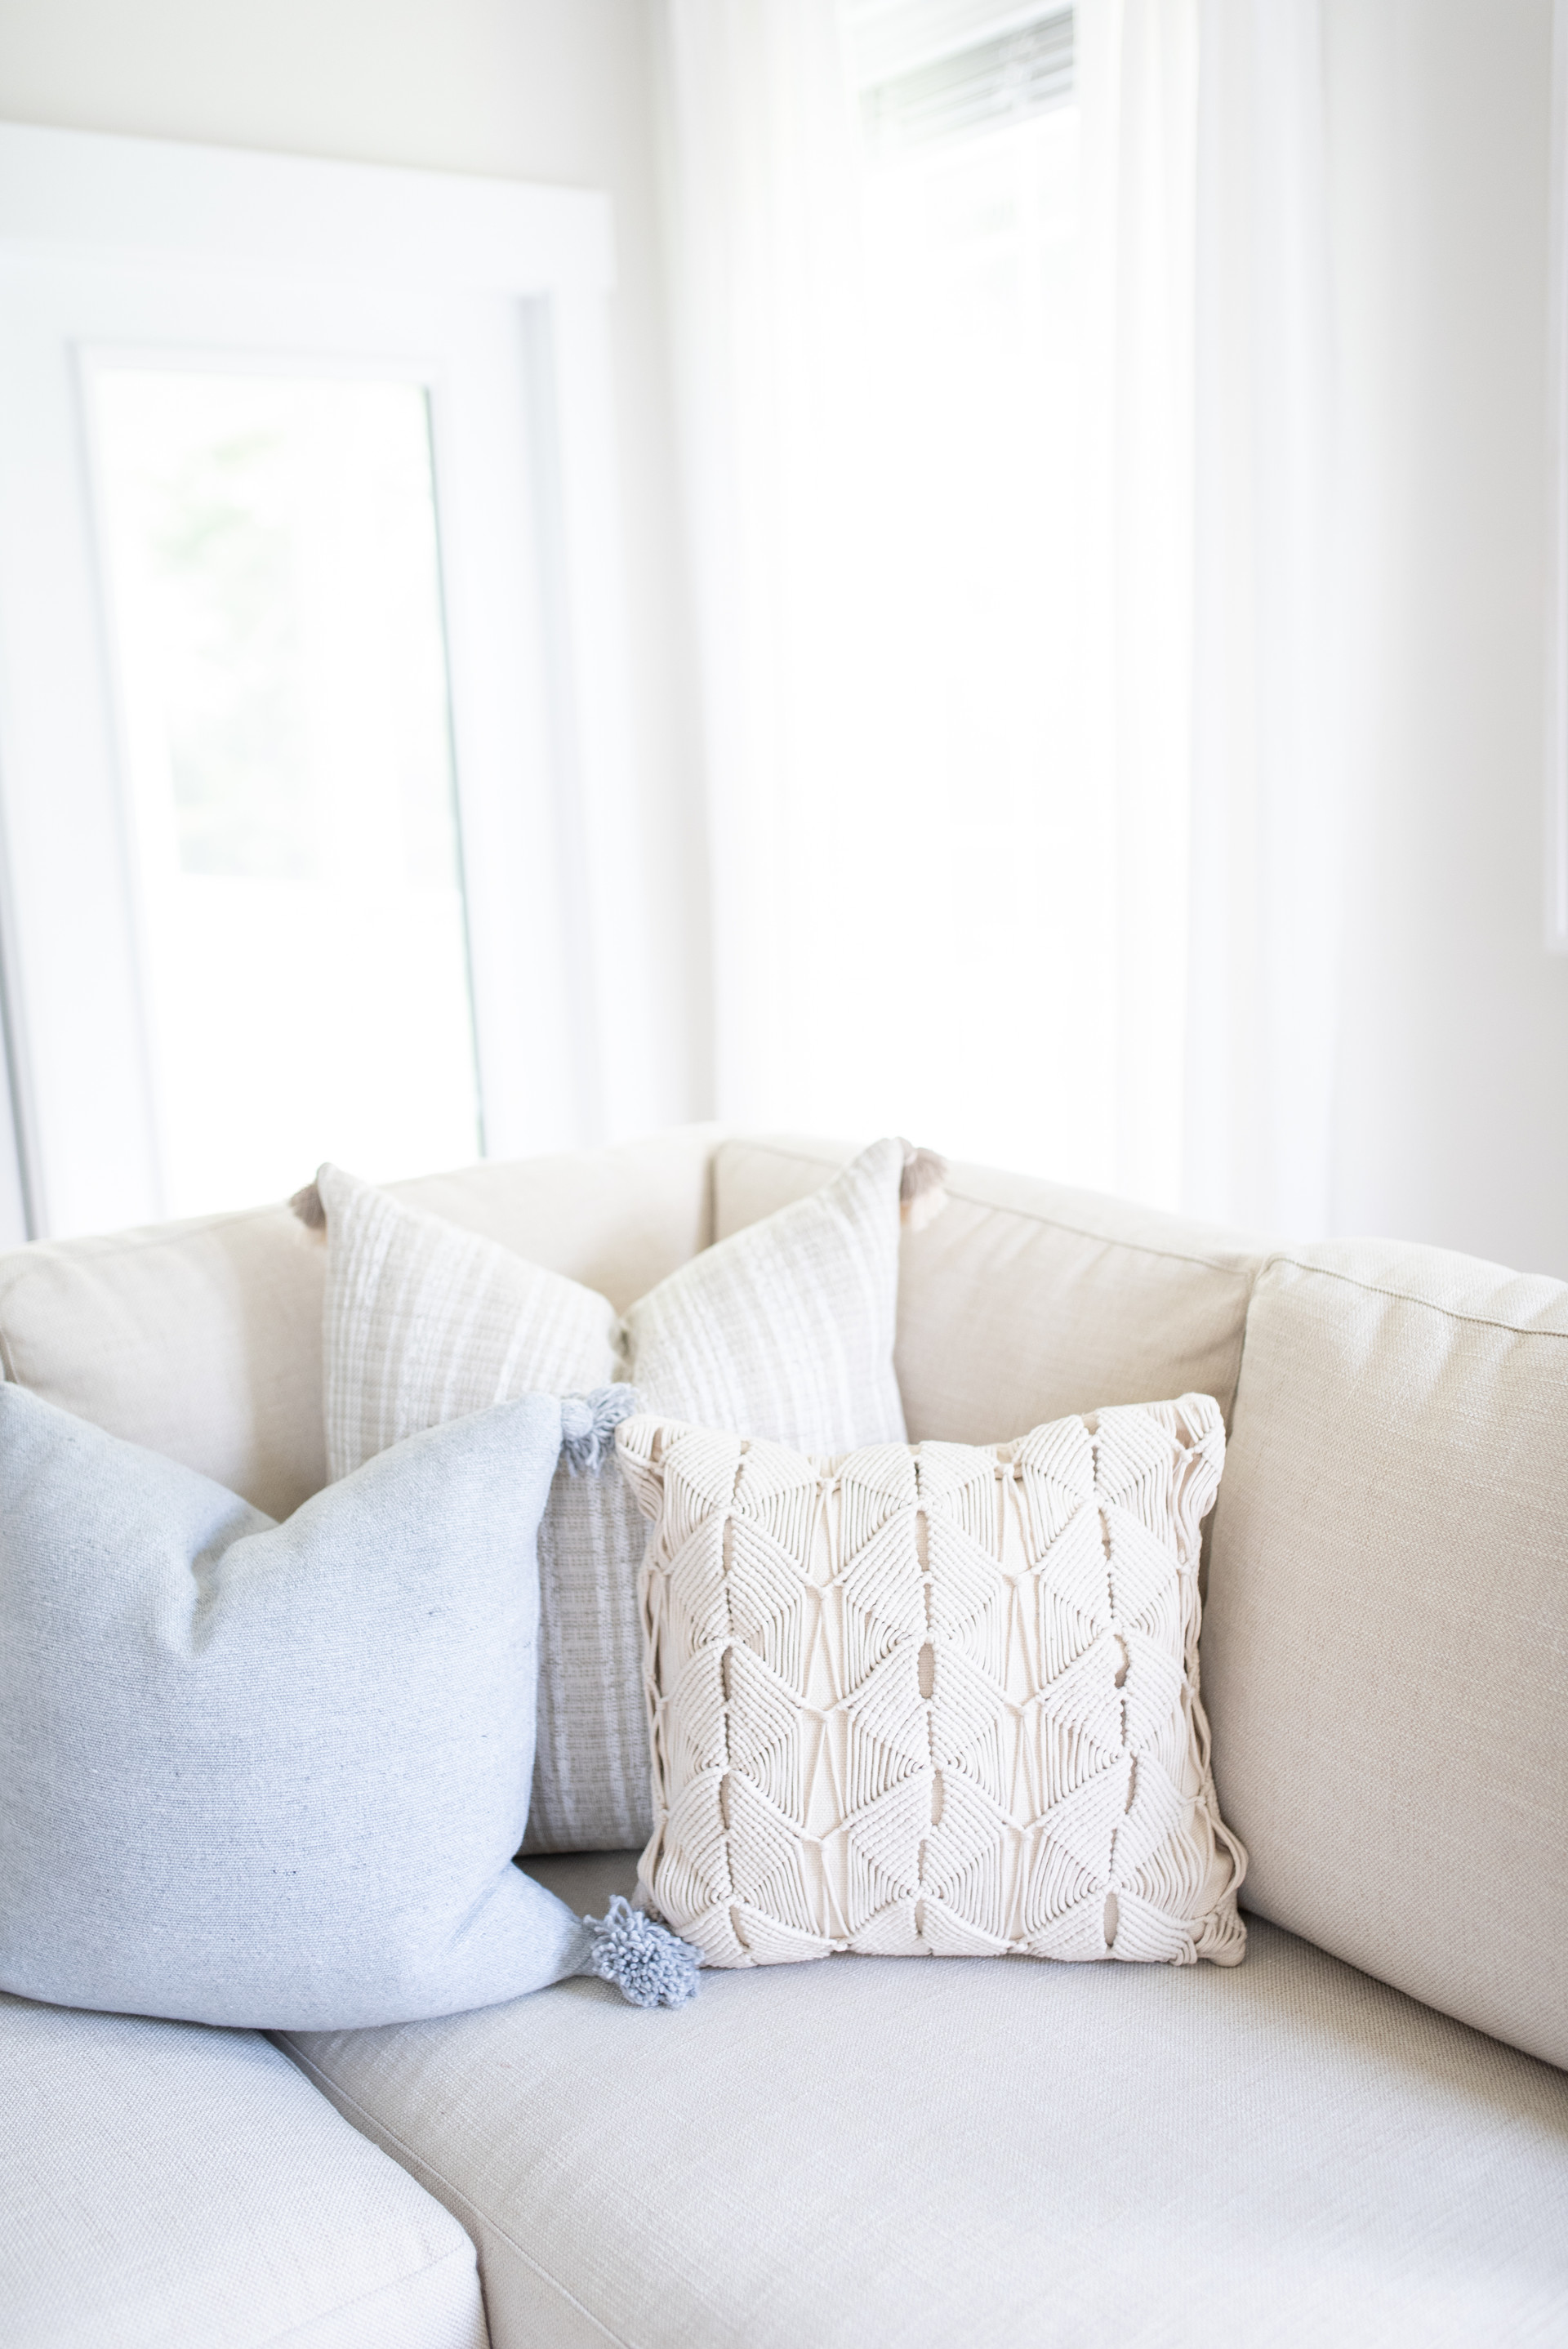 Perch-DI-Home-Living-20.jpg